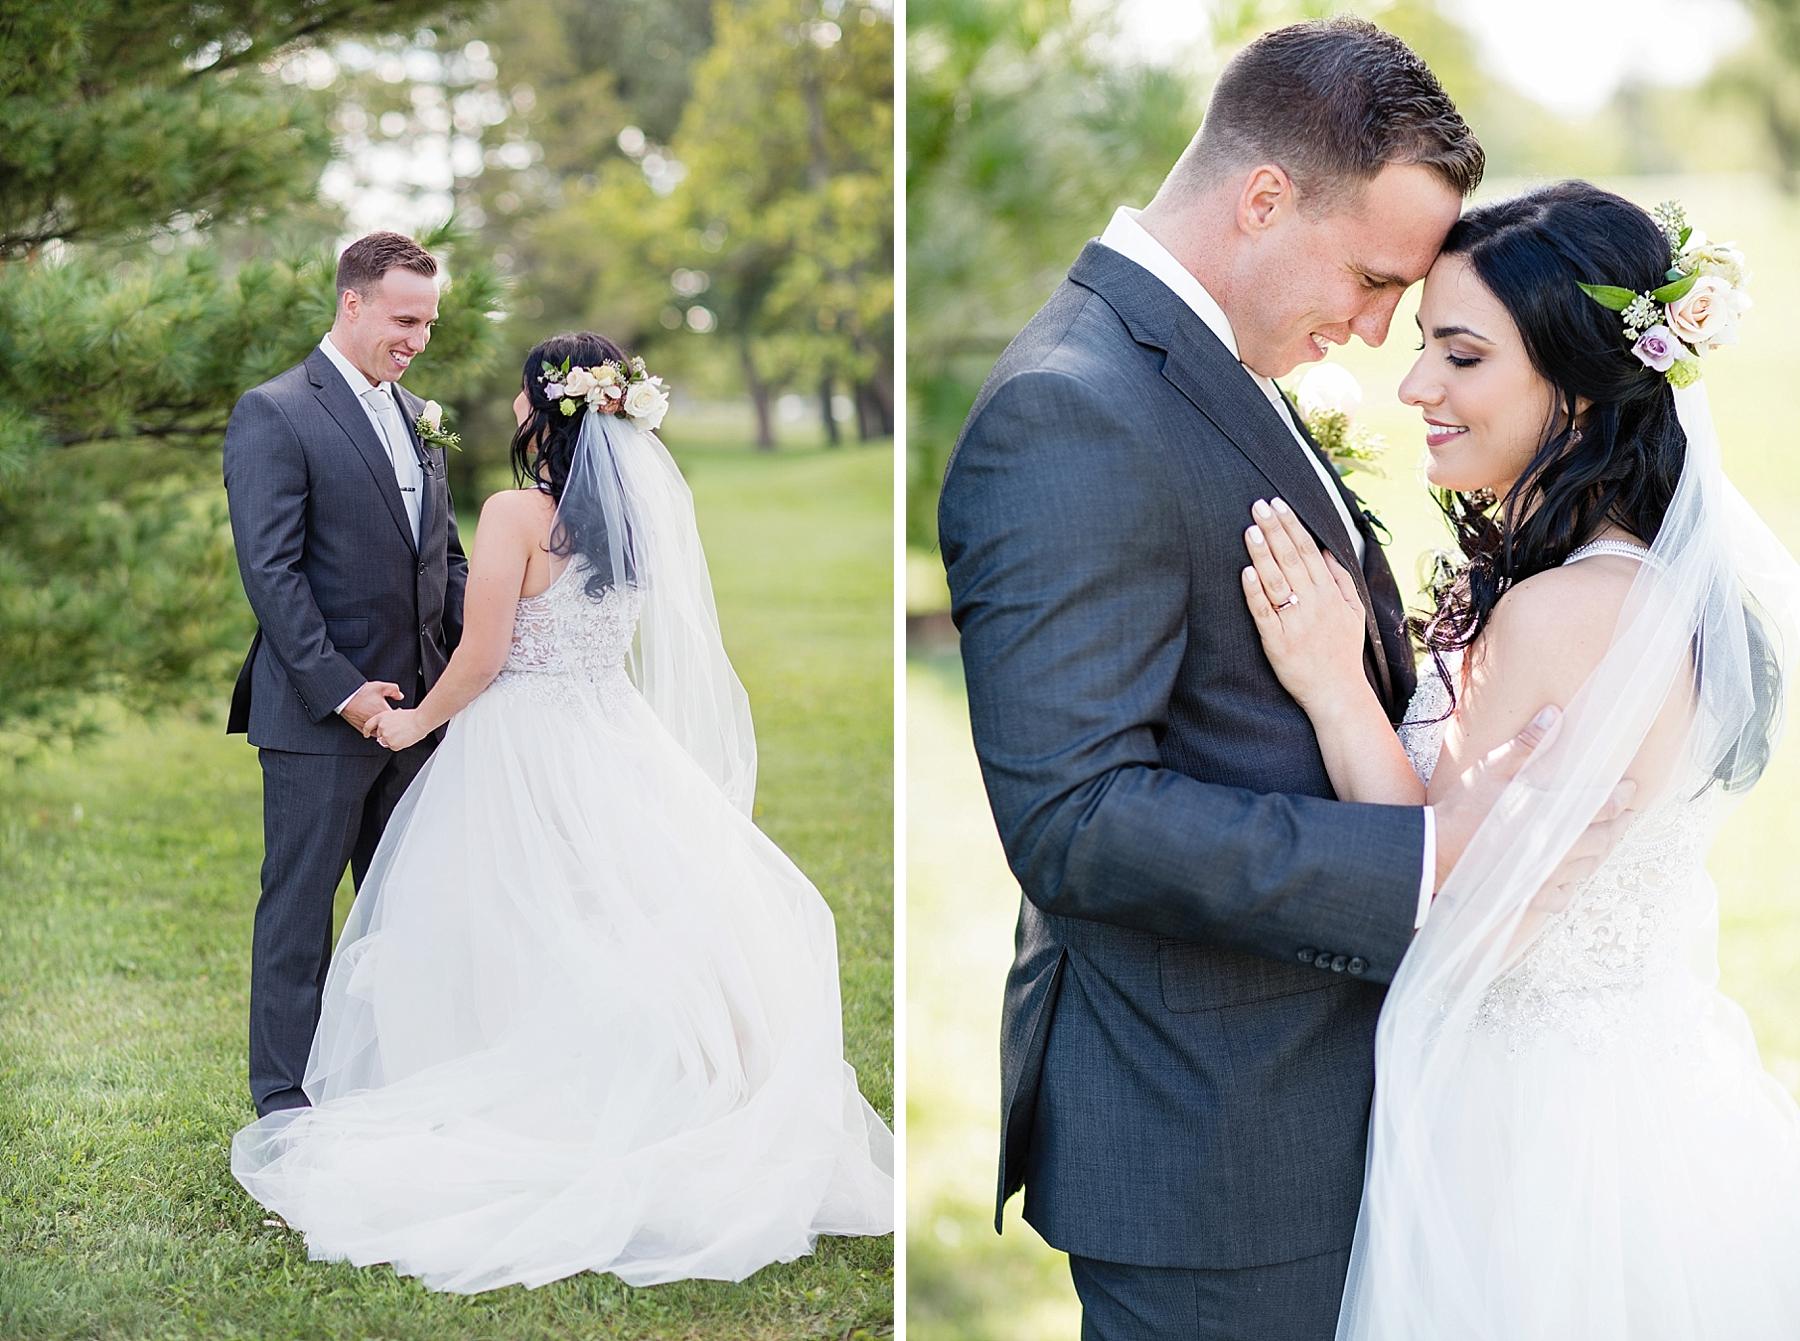 windsor-wedding-photographer-sprucewood-shores-winery-wedding-niagara-on-the-lake-wedding-photographer-eryn-shea-photography_0024.jpg